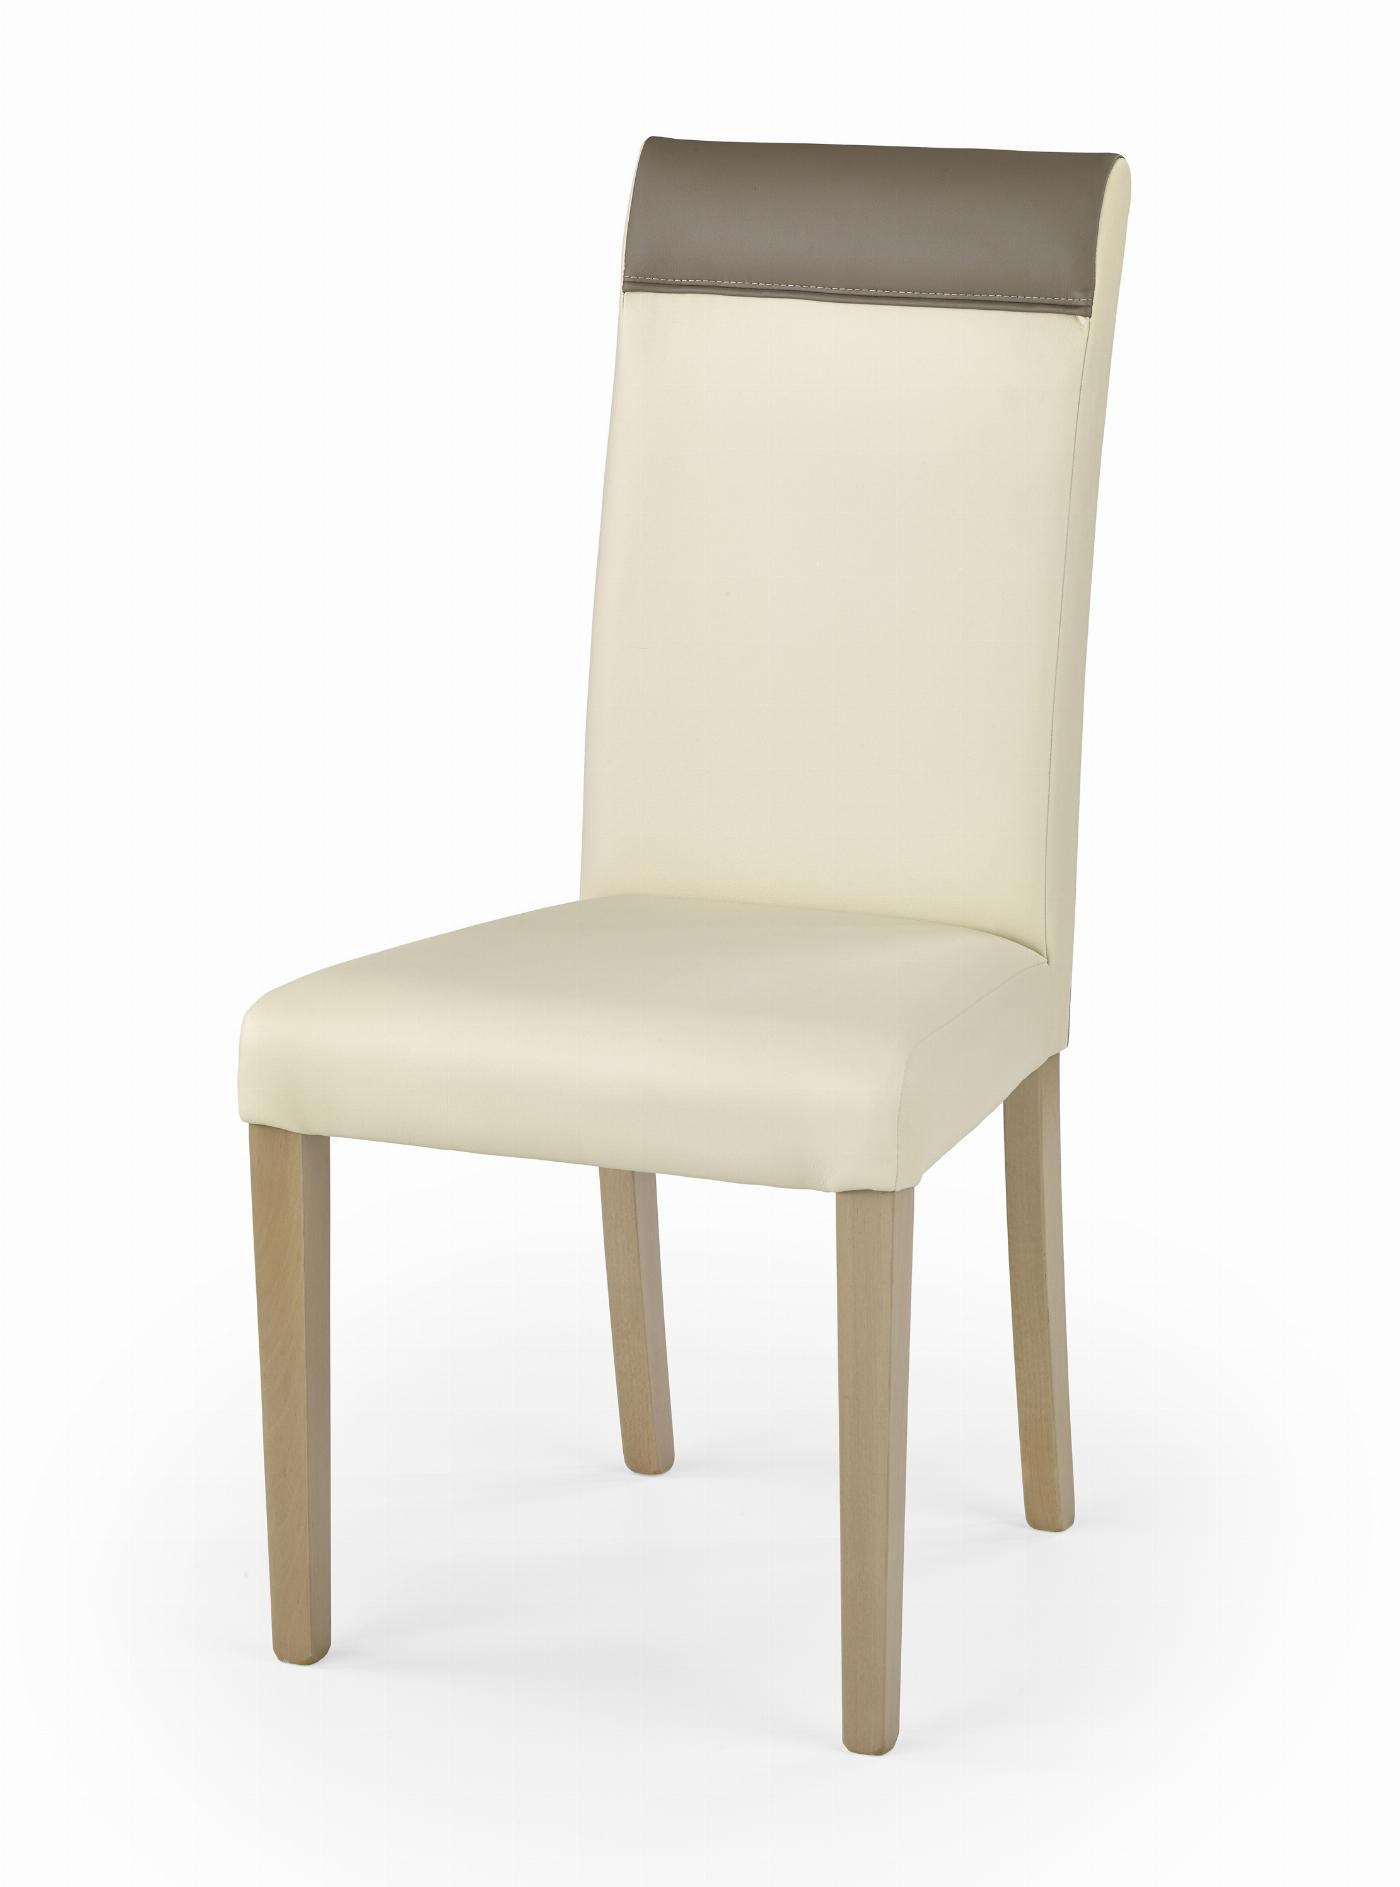 NORBERT krzesło dąb sonoma / tap: kremowy (1p=2szt)